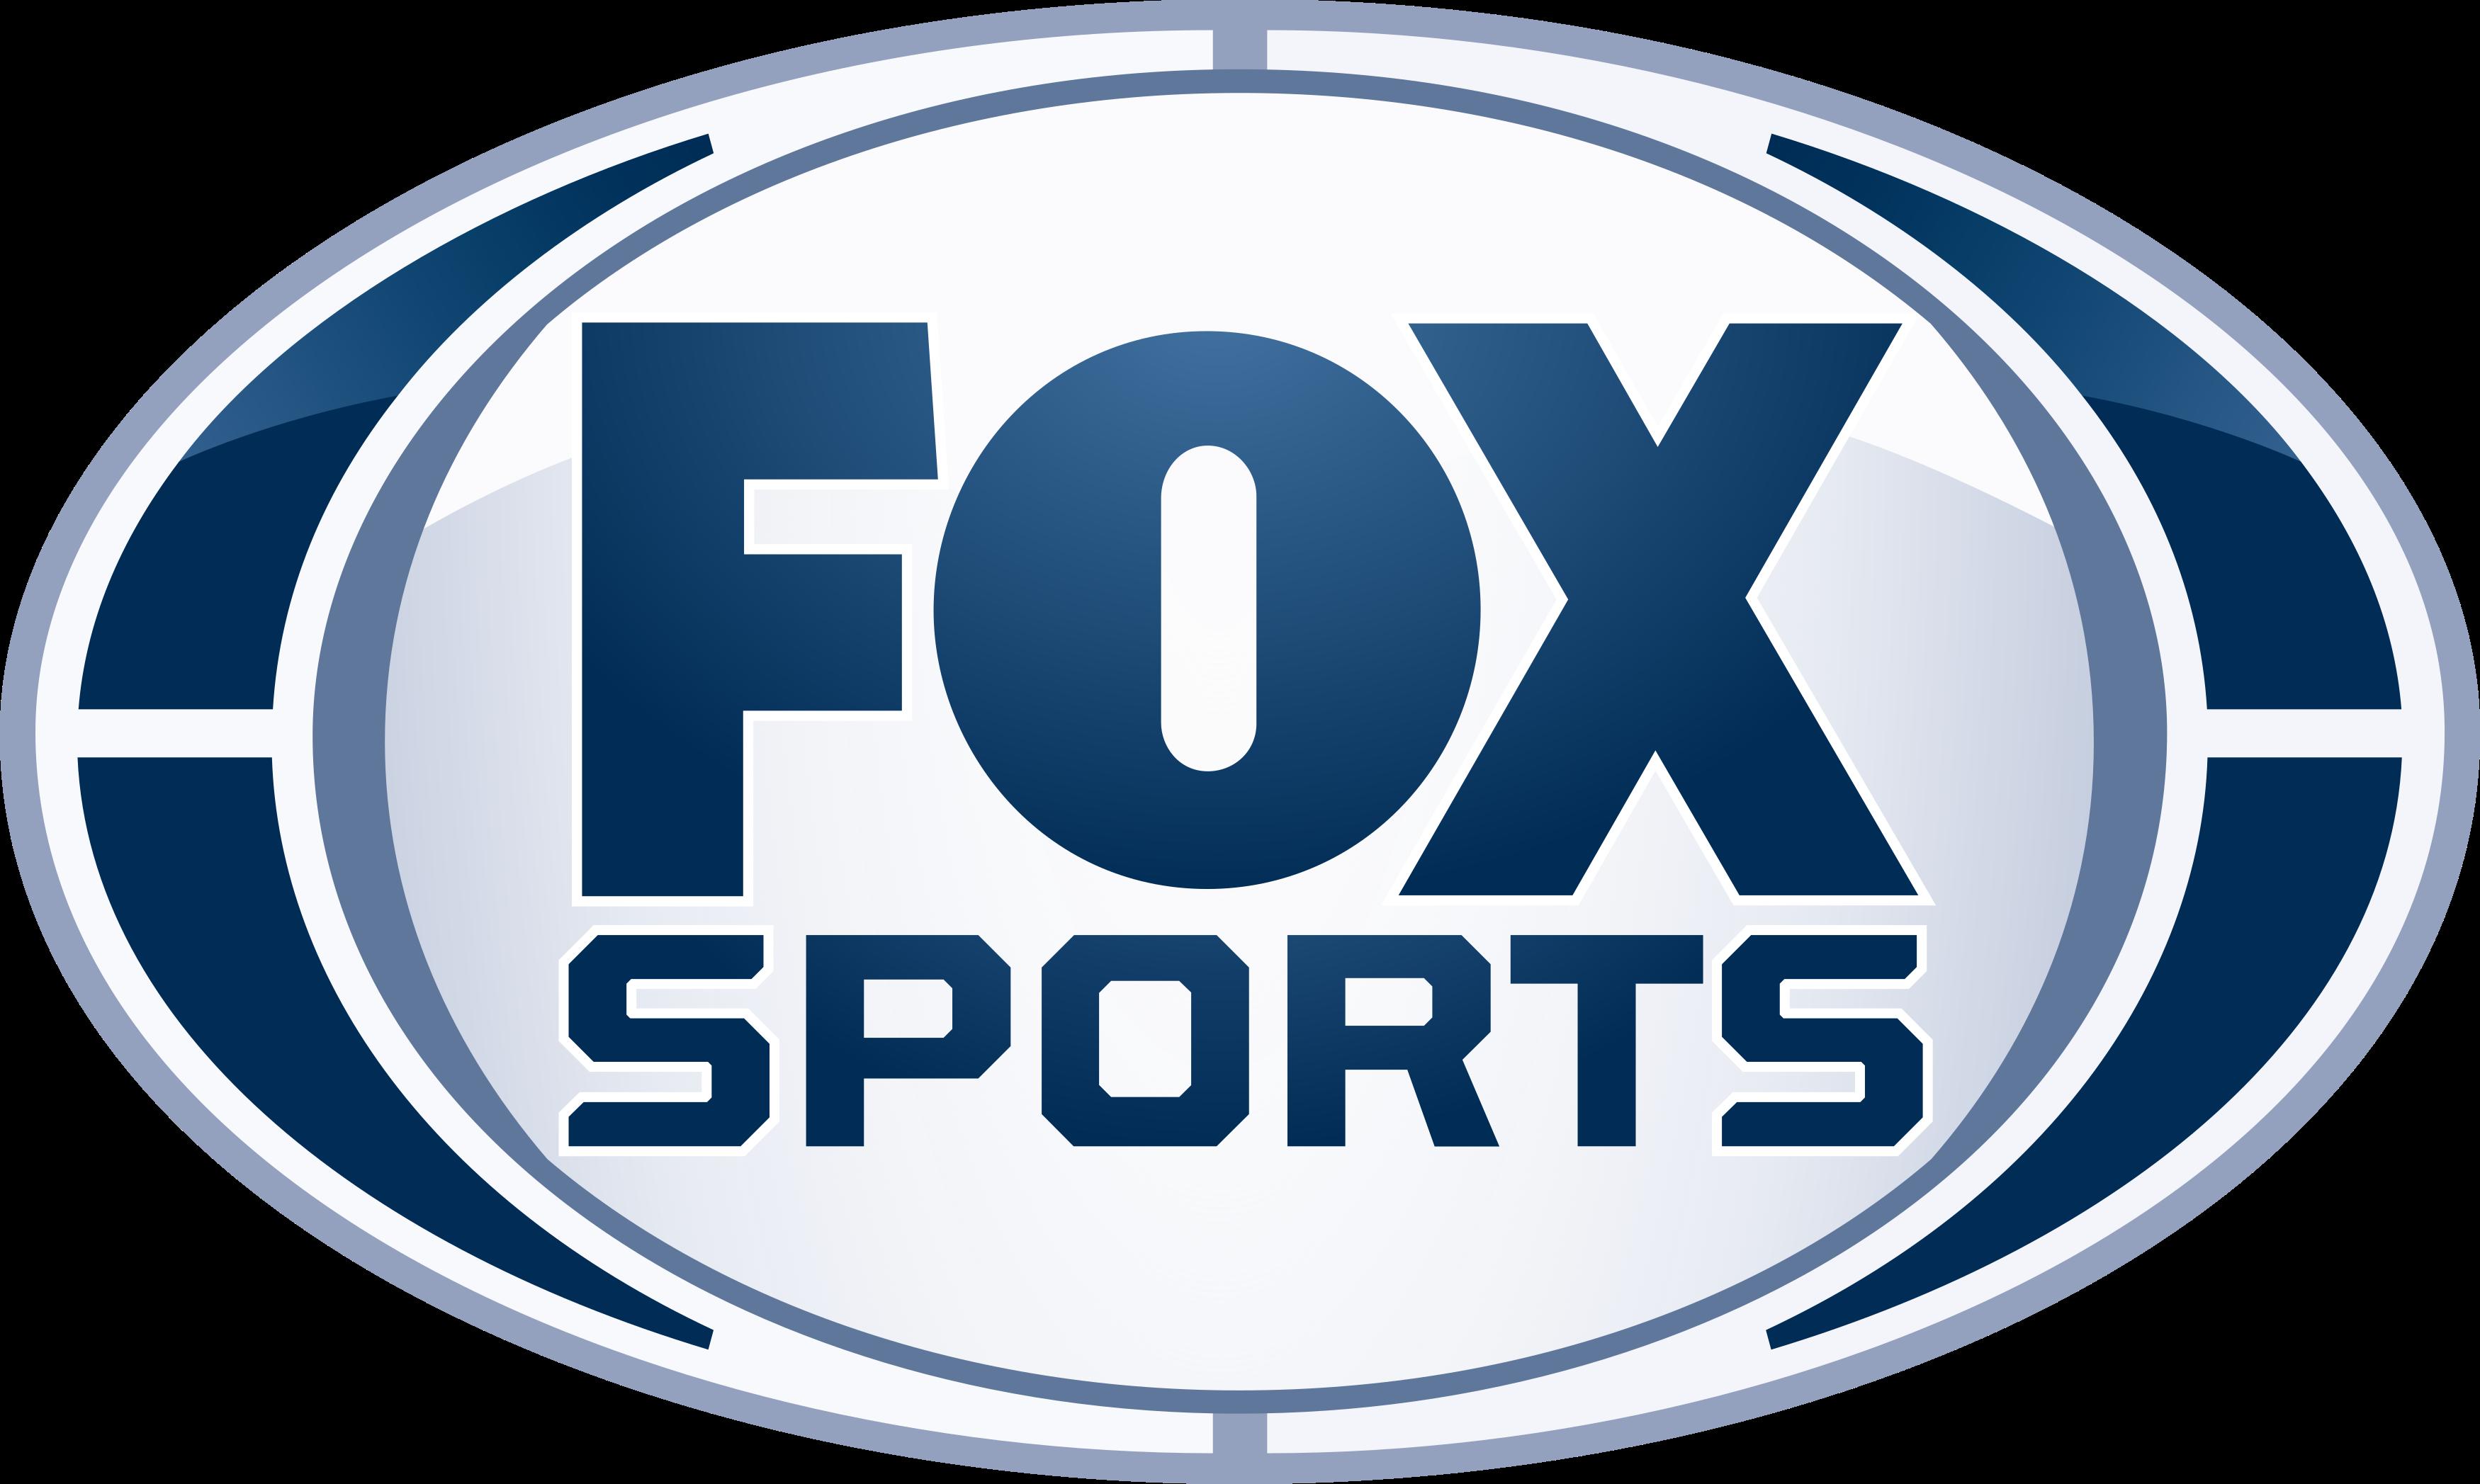 Fox Sports | UTDN